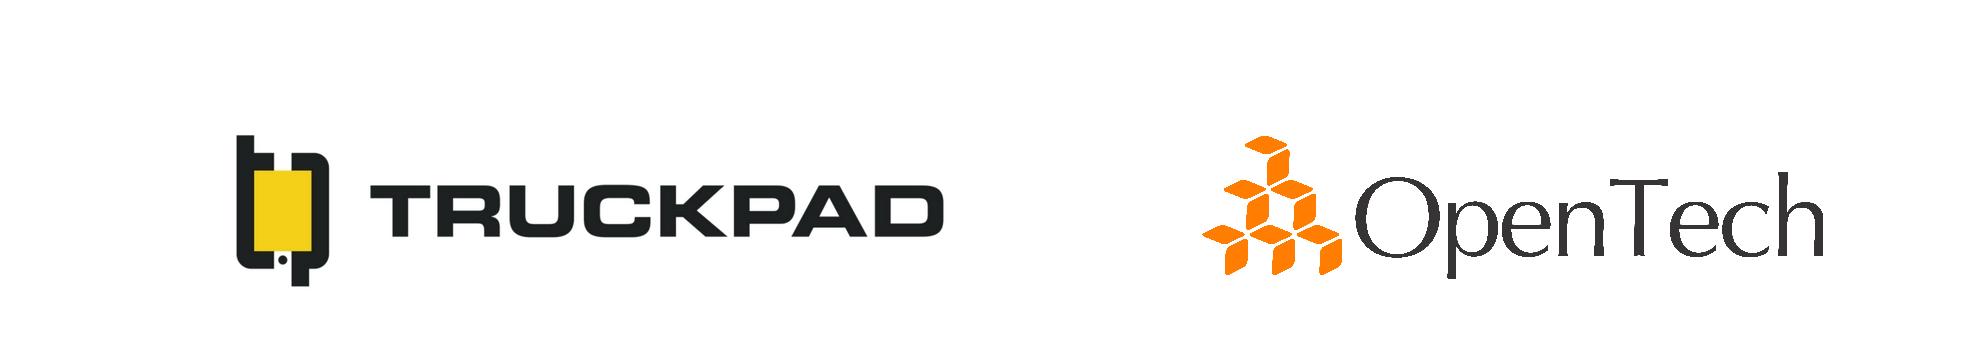 Logo TruckPad e Opentech